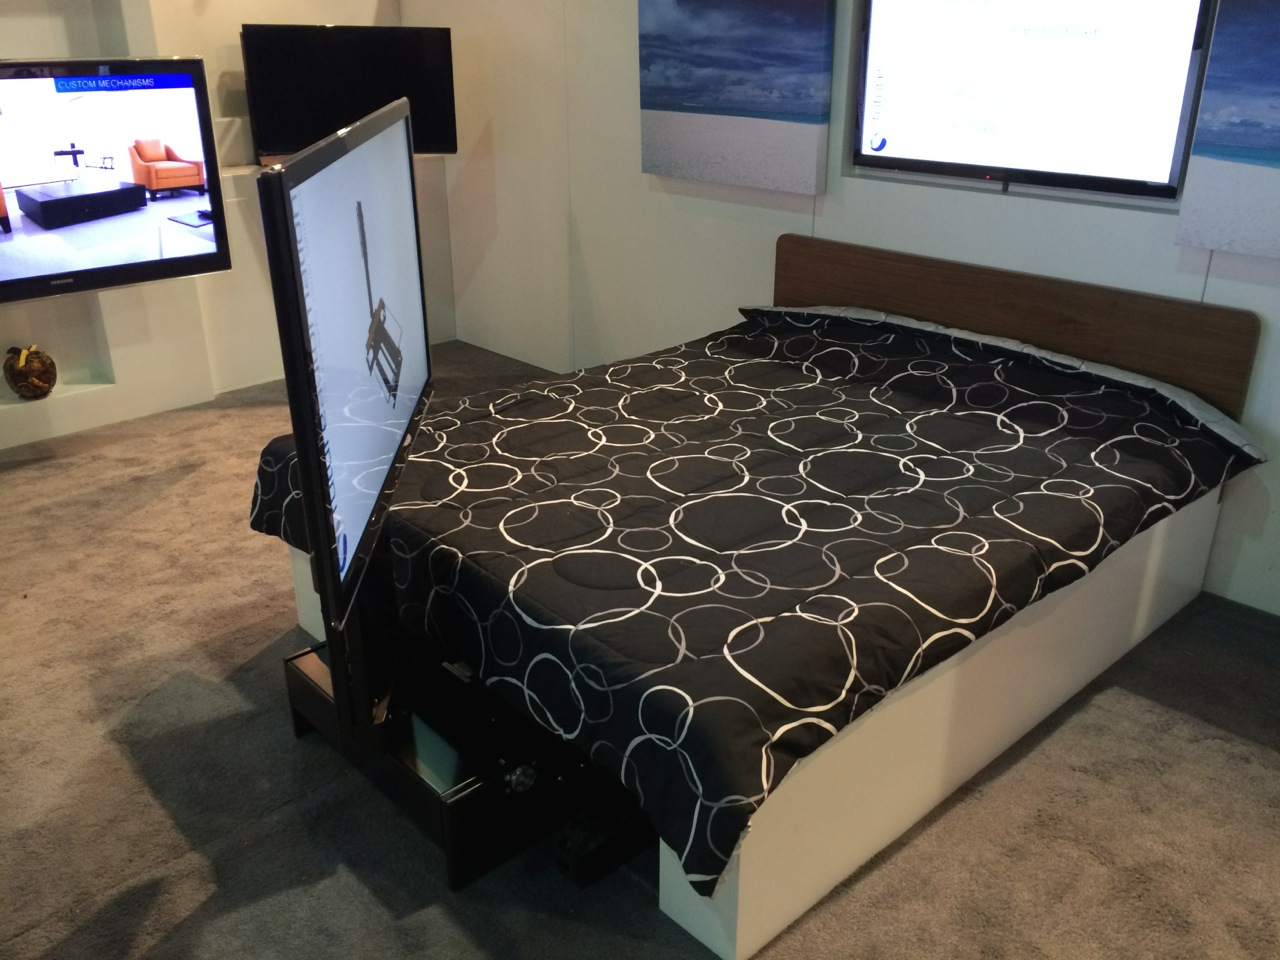 Motorized Under-bed TV mount